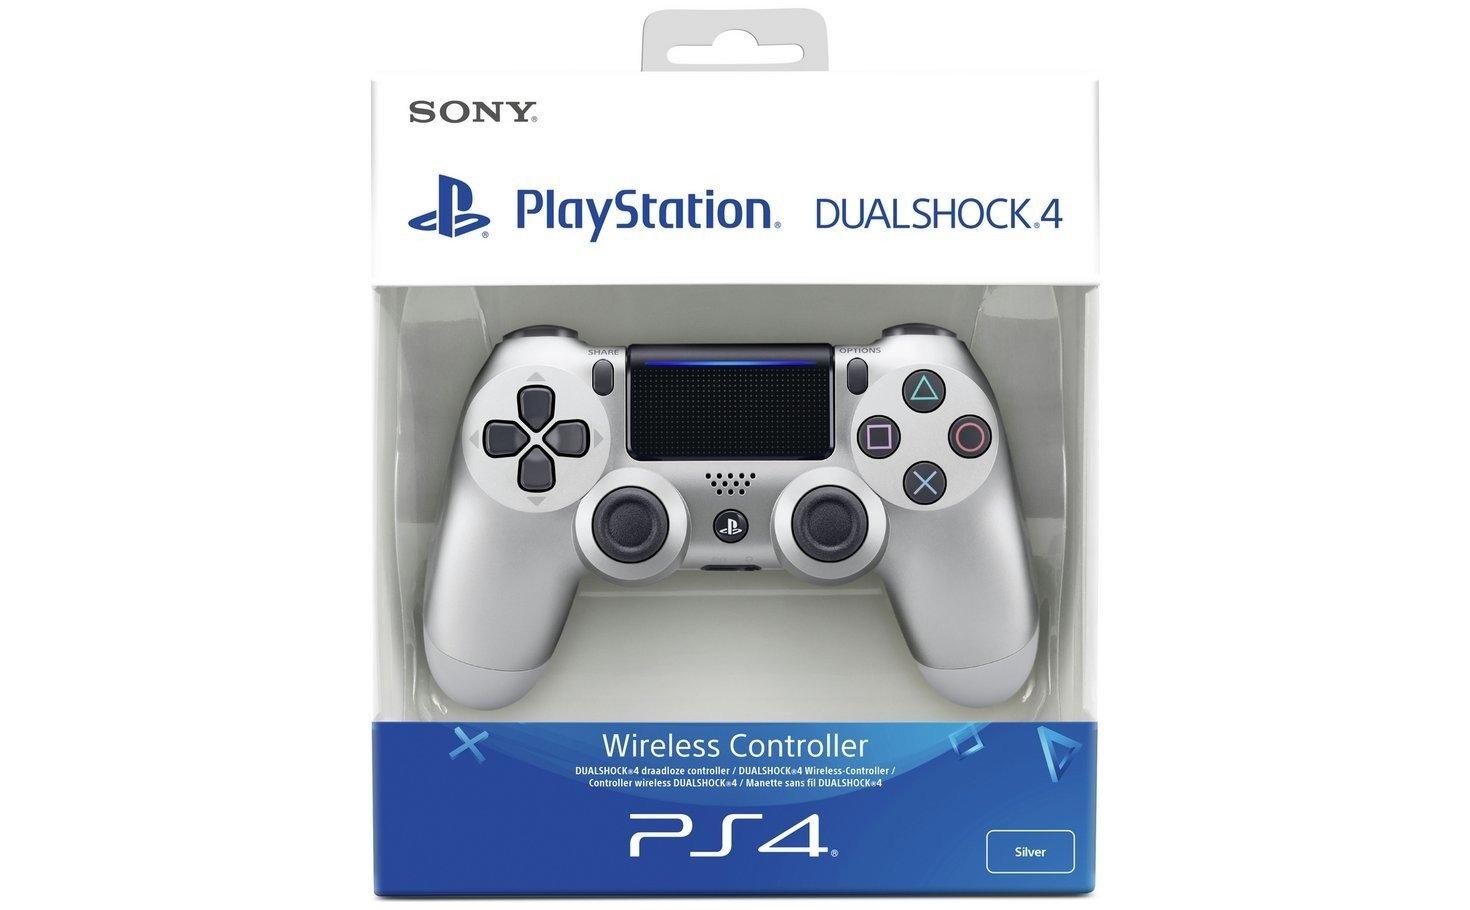 Беспроводной геймпад SONY Dualshock 4 V2 Silver для PS4 (9895954) фото 5